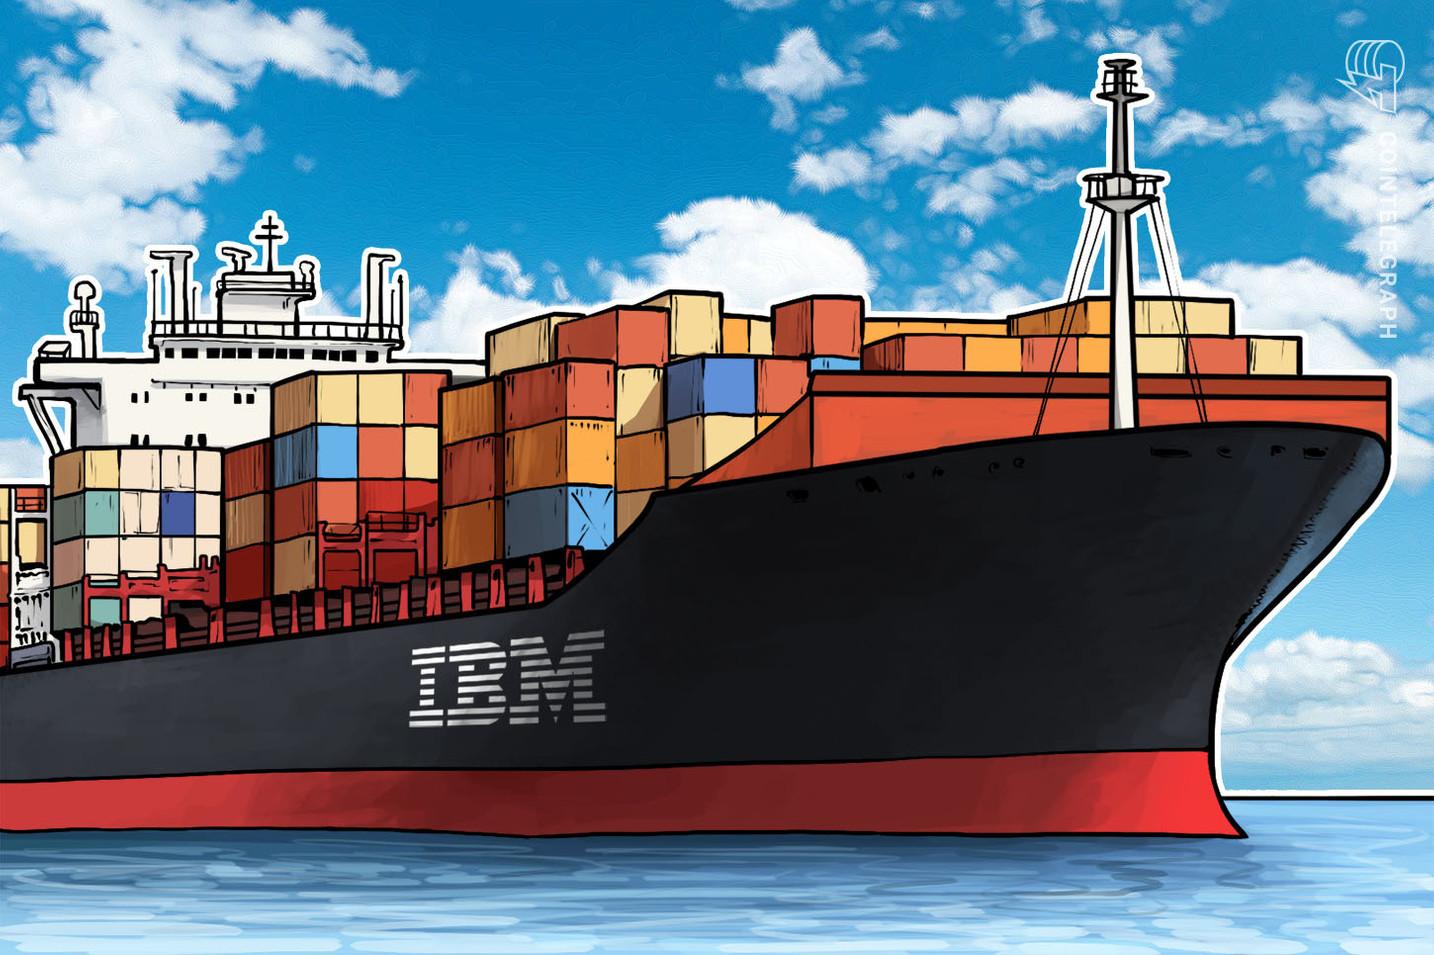 IBM conclui envio de frutas usando blockchain na Ásia Pacífico